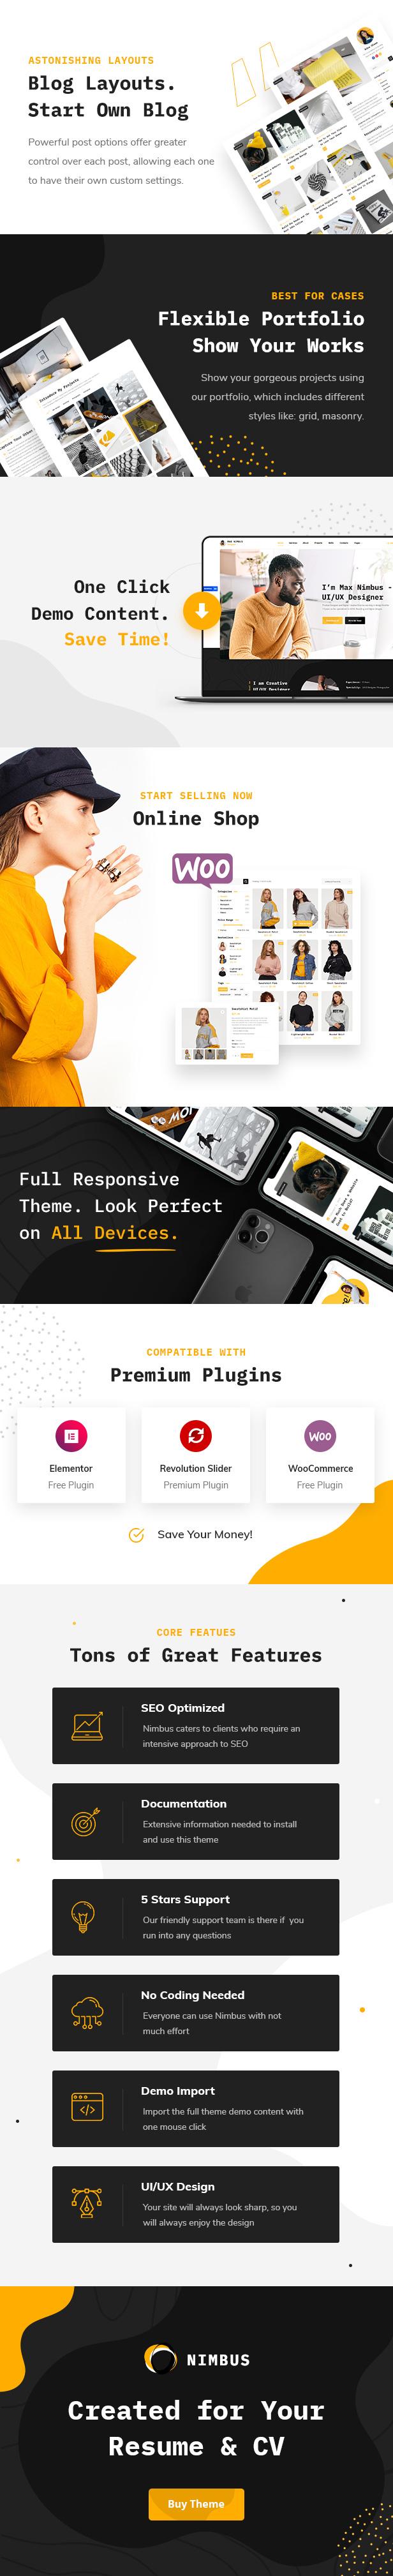 Nimbus - CV & Portfolio WordPress Theme - 2